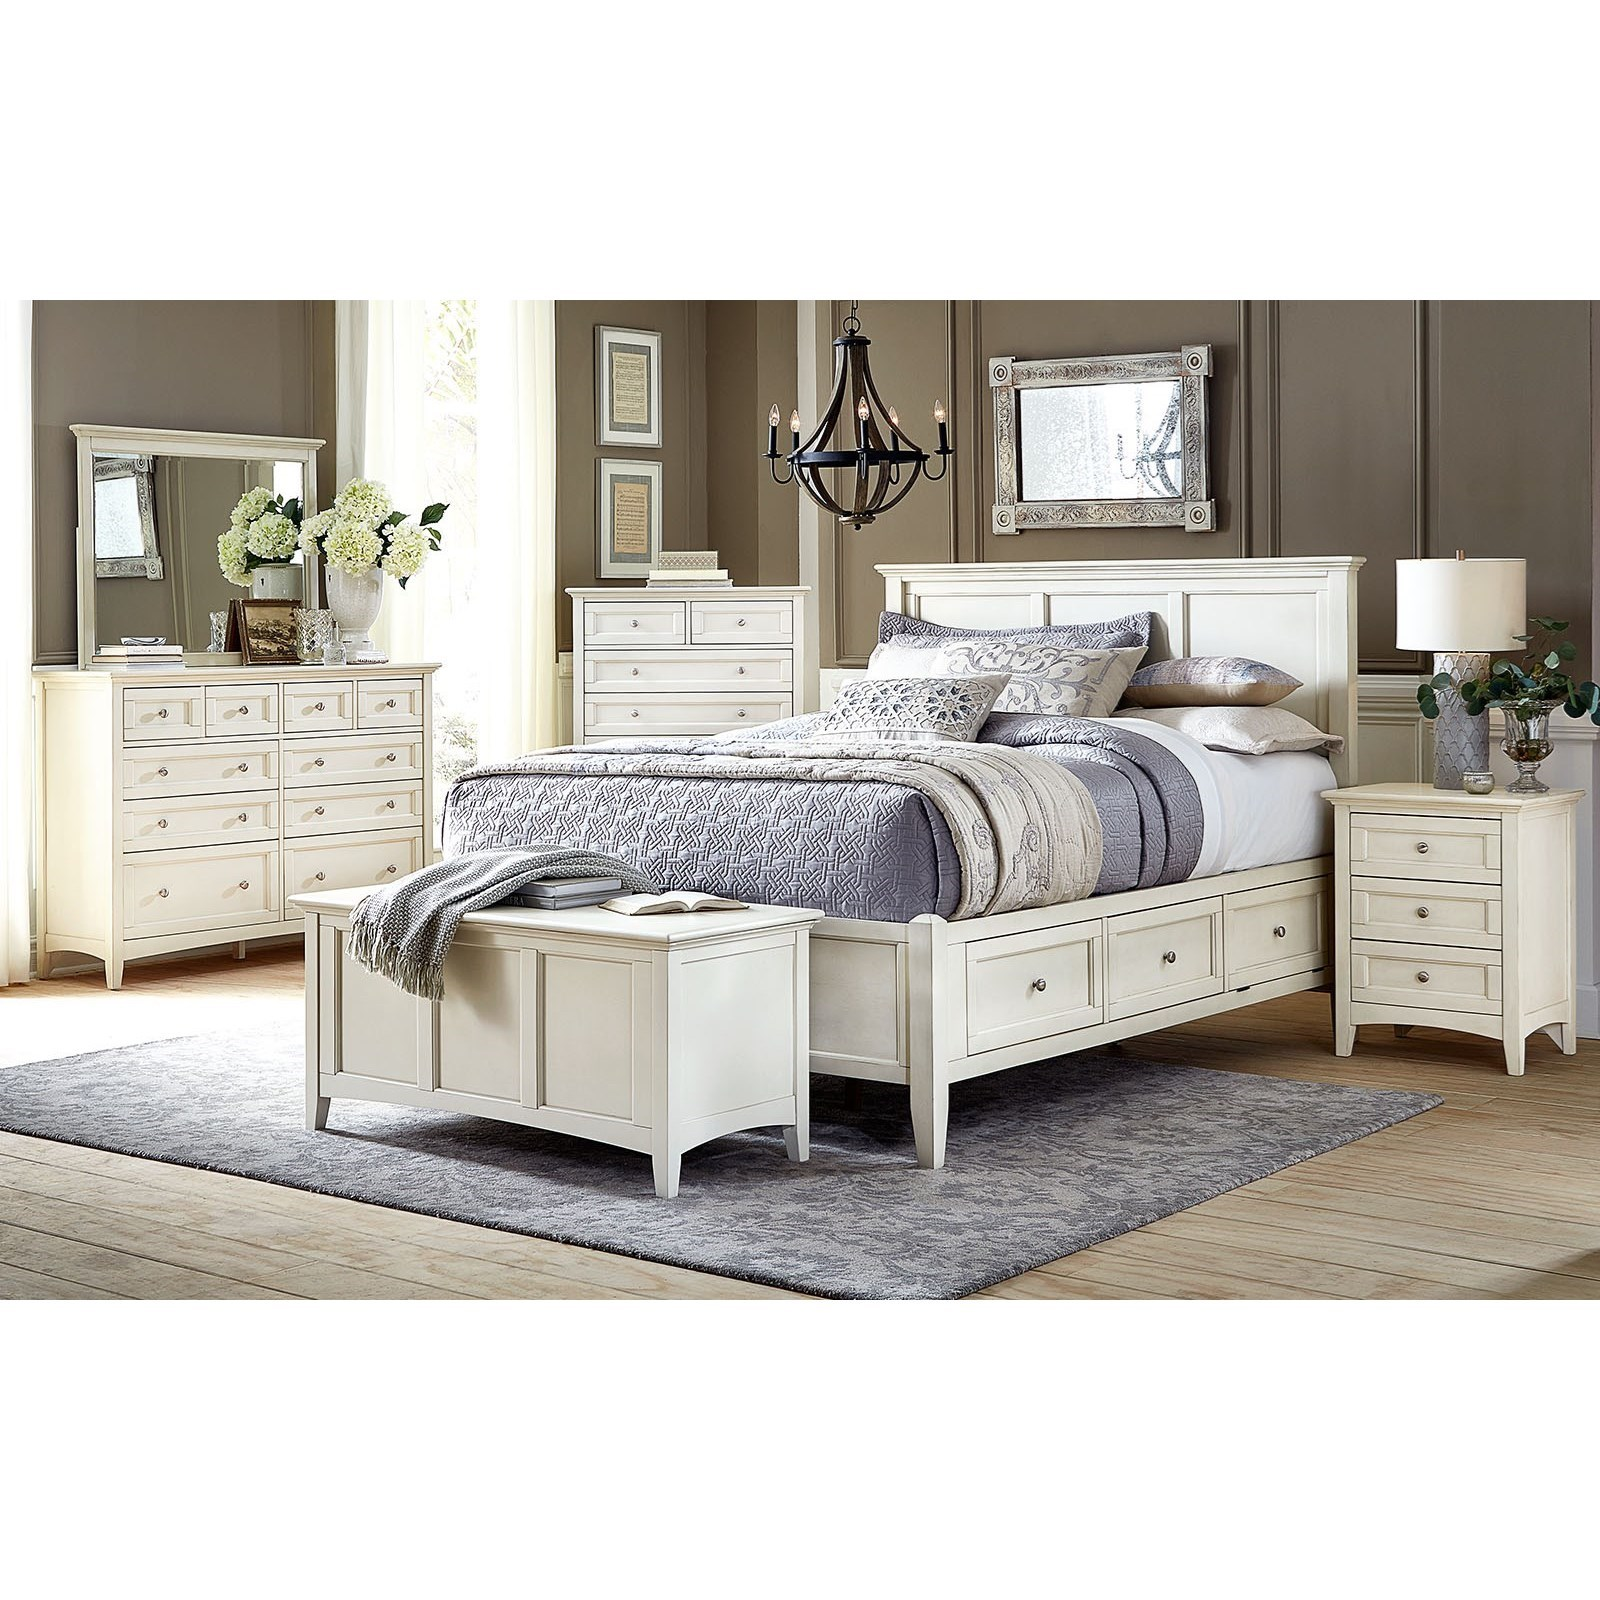 Northlake Queen Bedroom Group by AAmerica at Wilson's Furniture